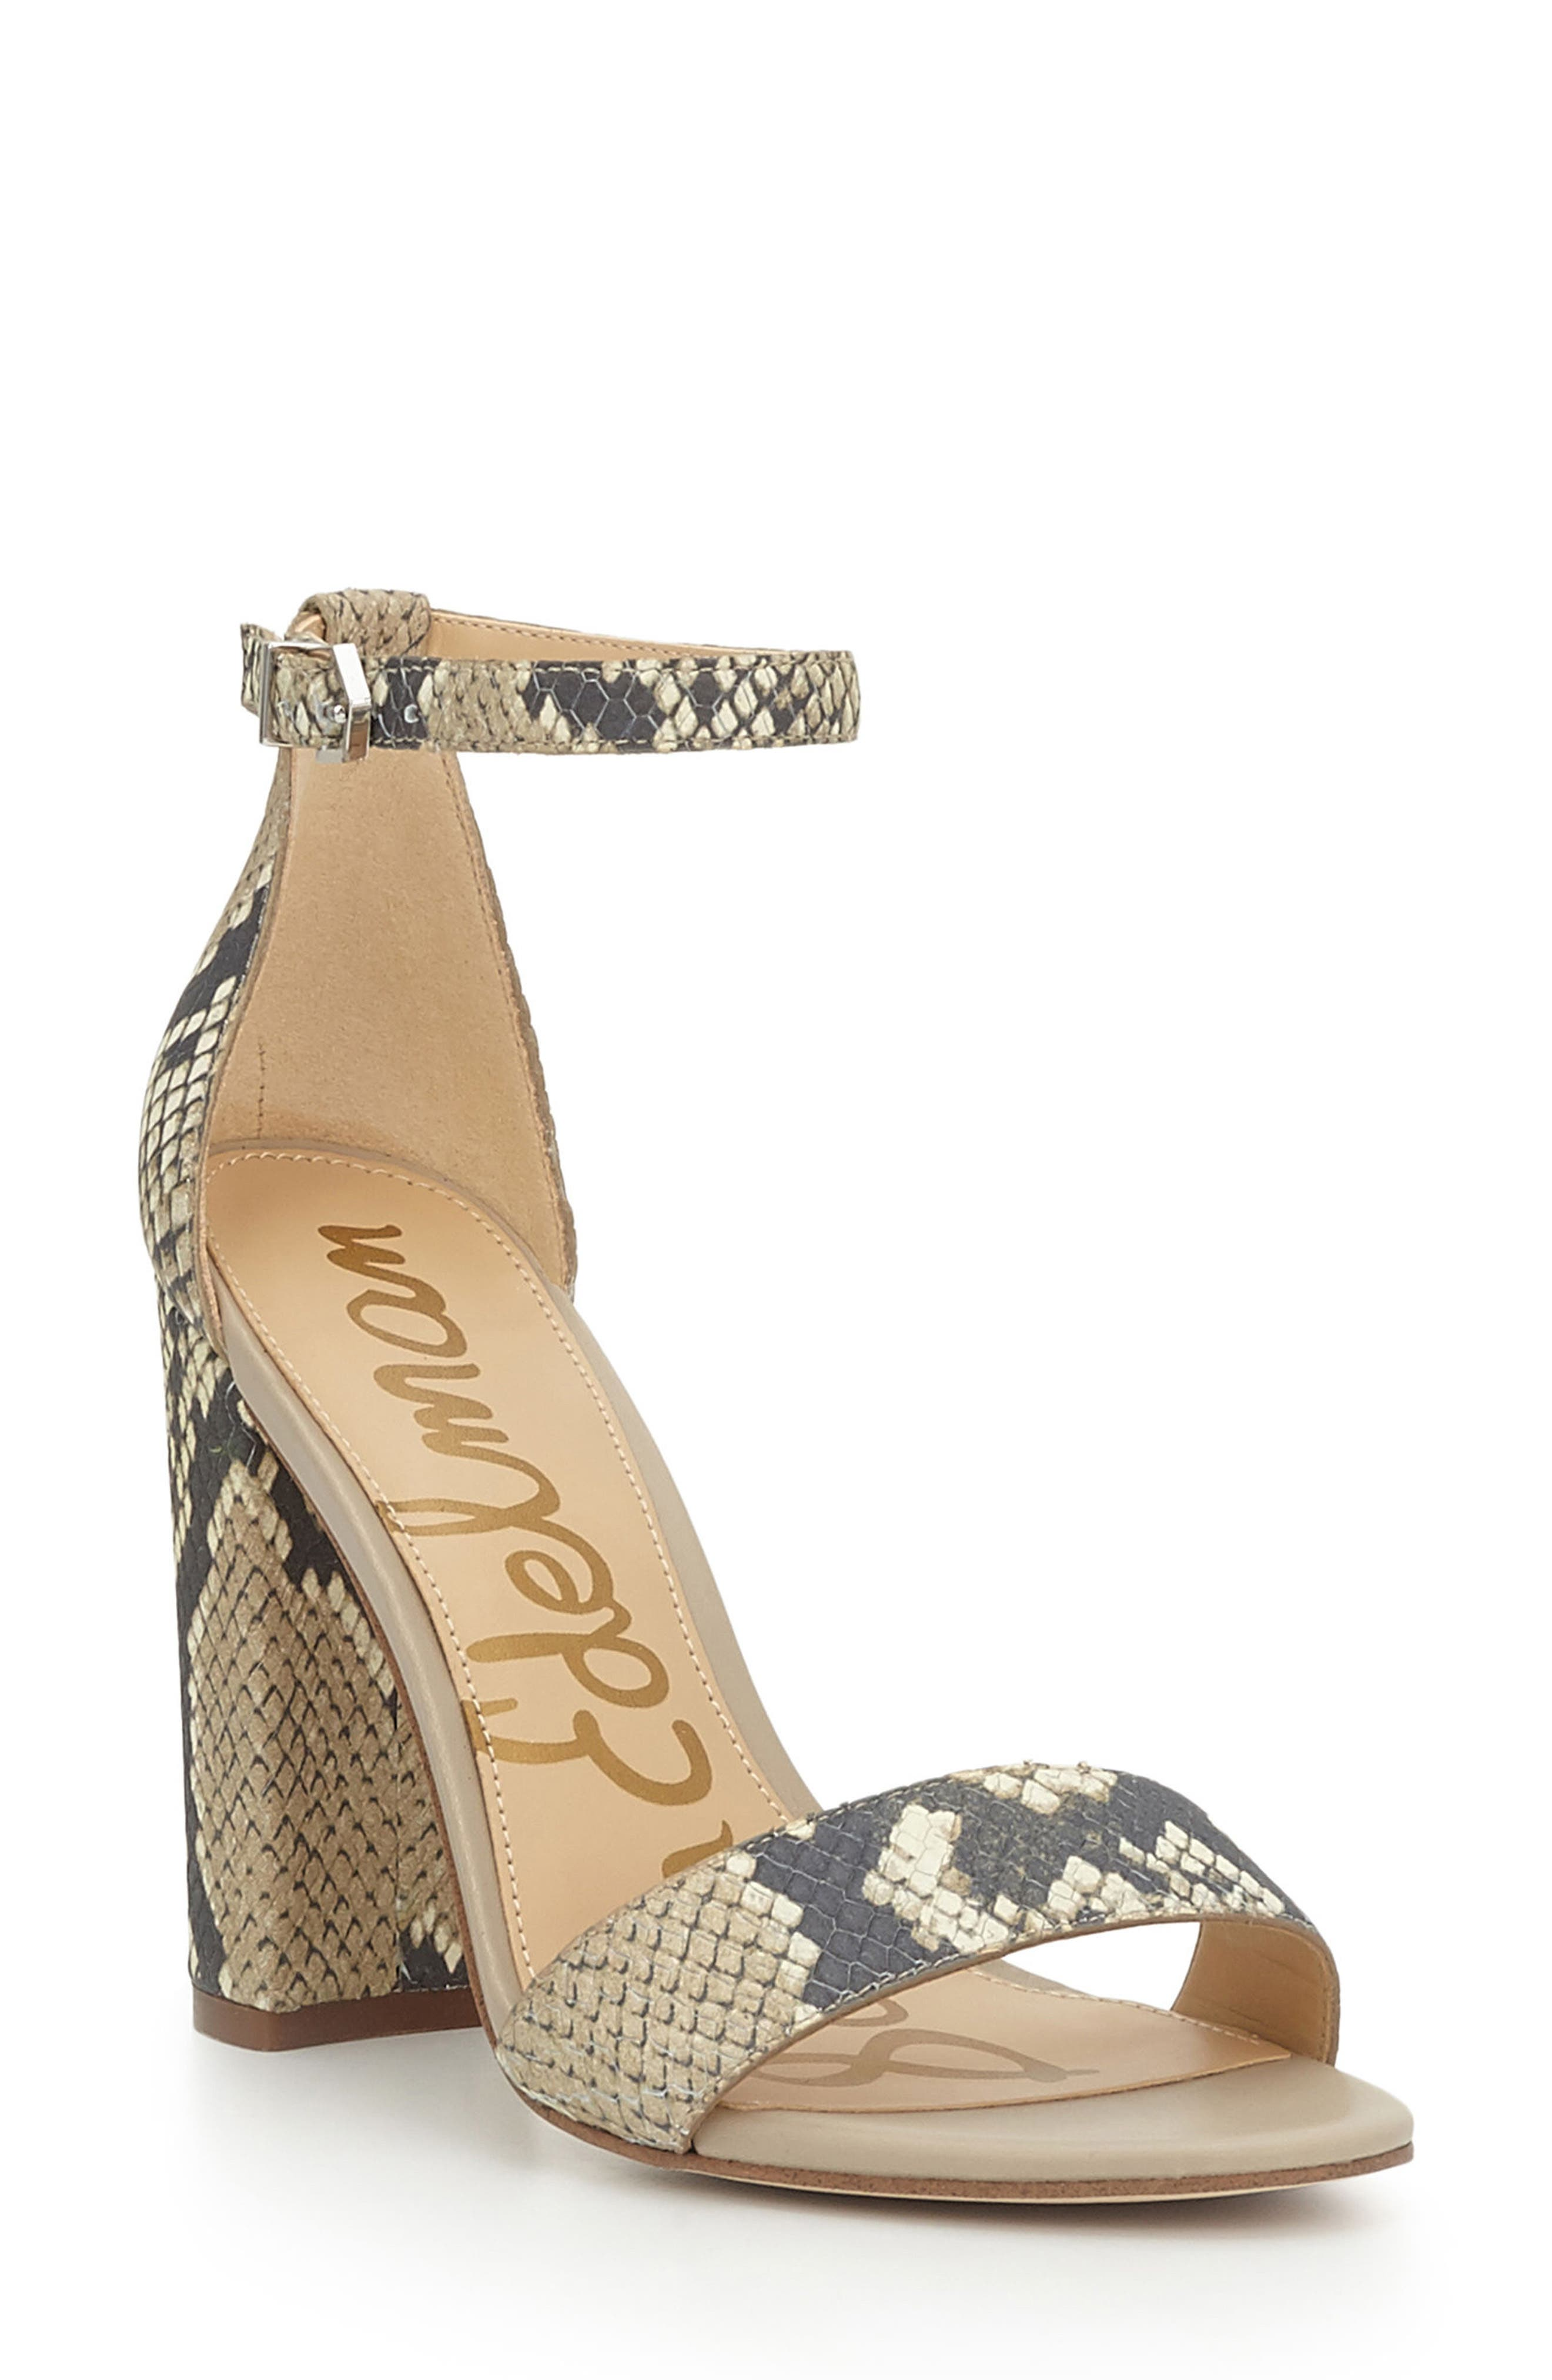 Alternate Image 1 Selected - Sam Edelman Yaro Ankle Strap Sandal (Women)